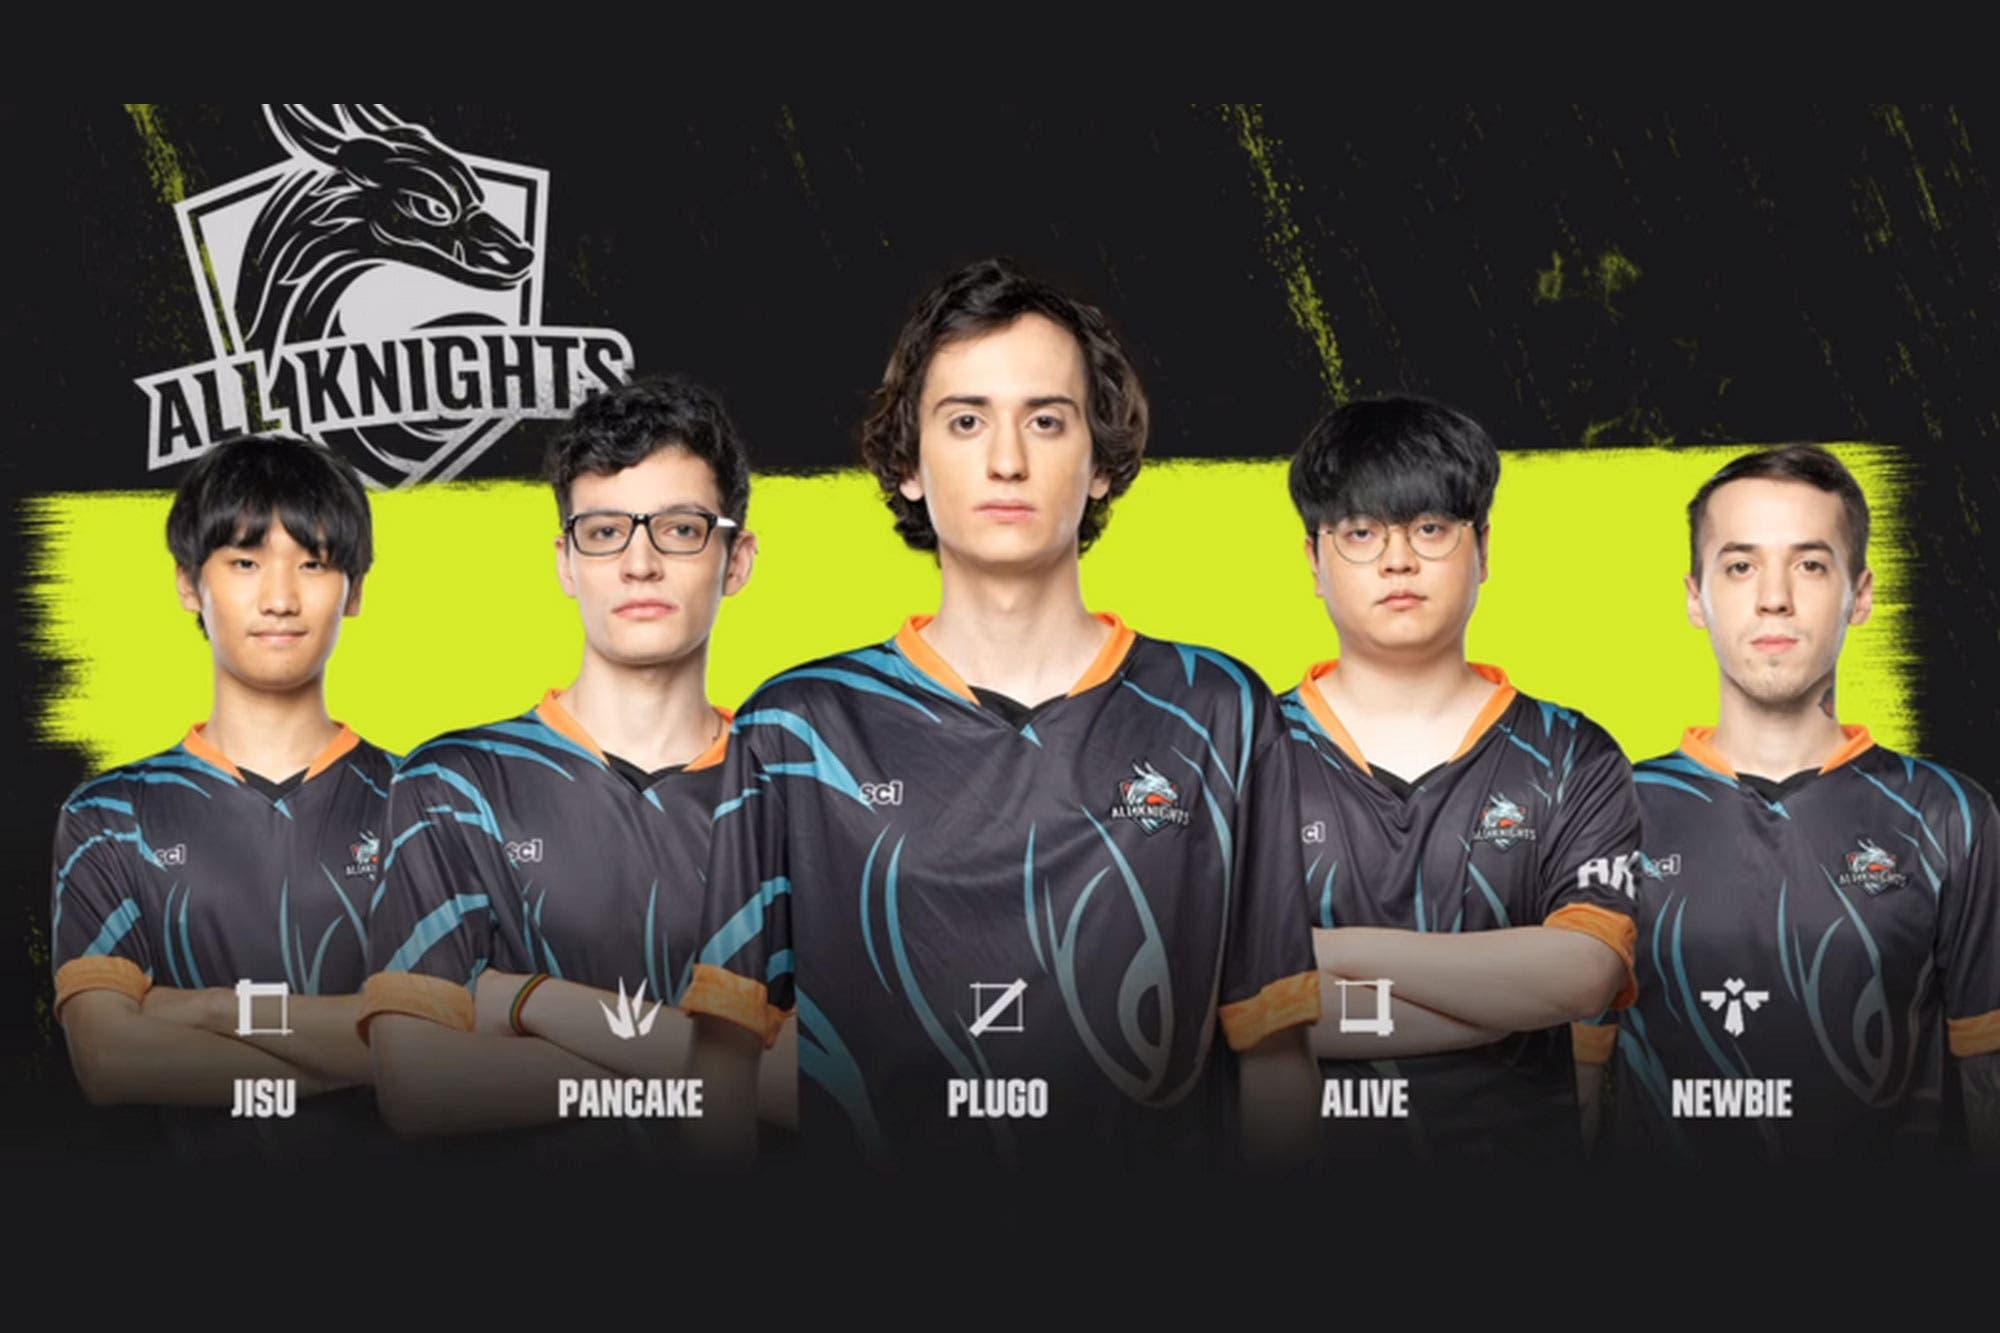 Con toque argentino: All Knights se coronó campeón de America de League of Legends